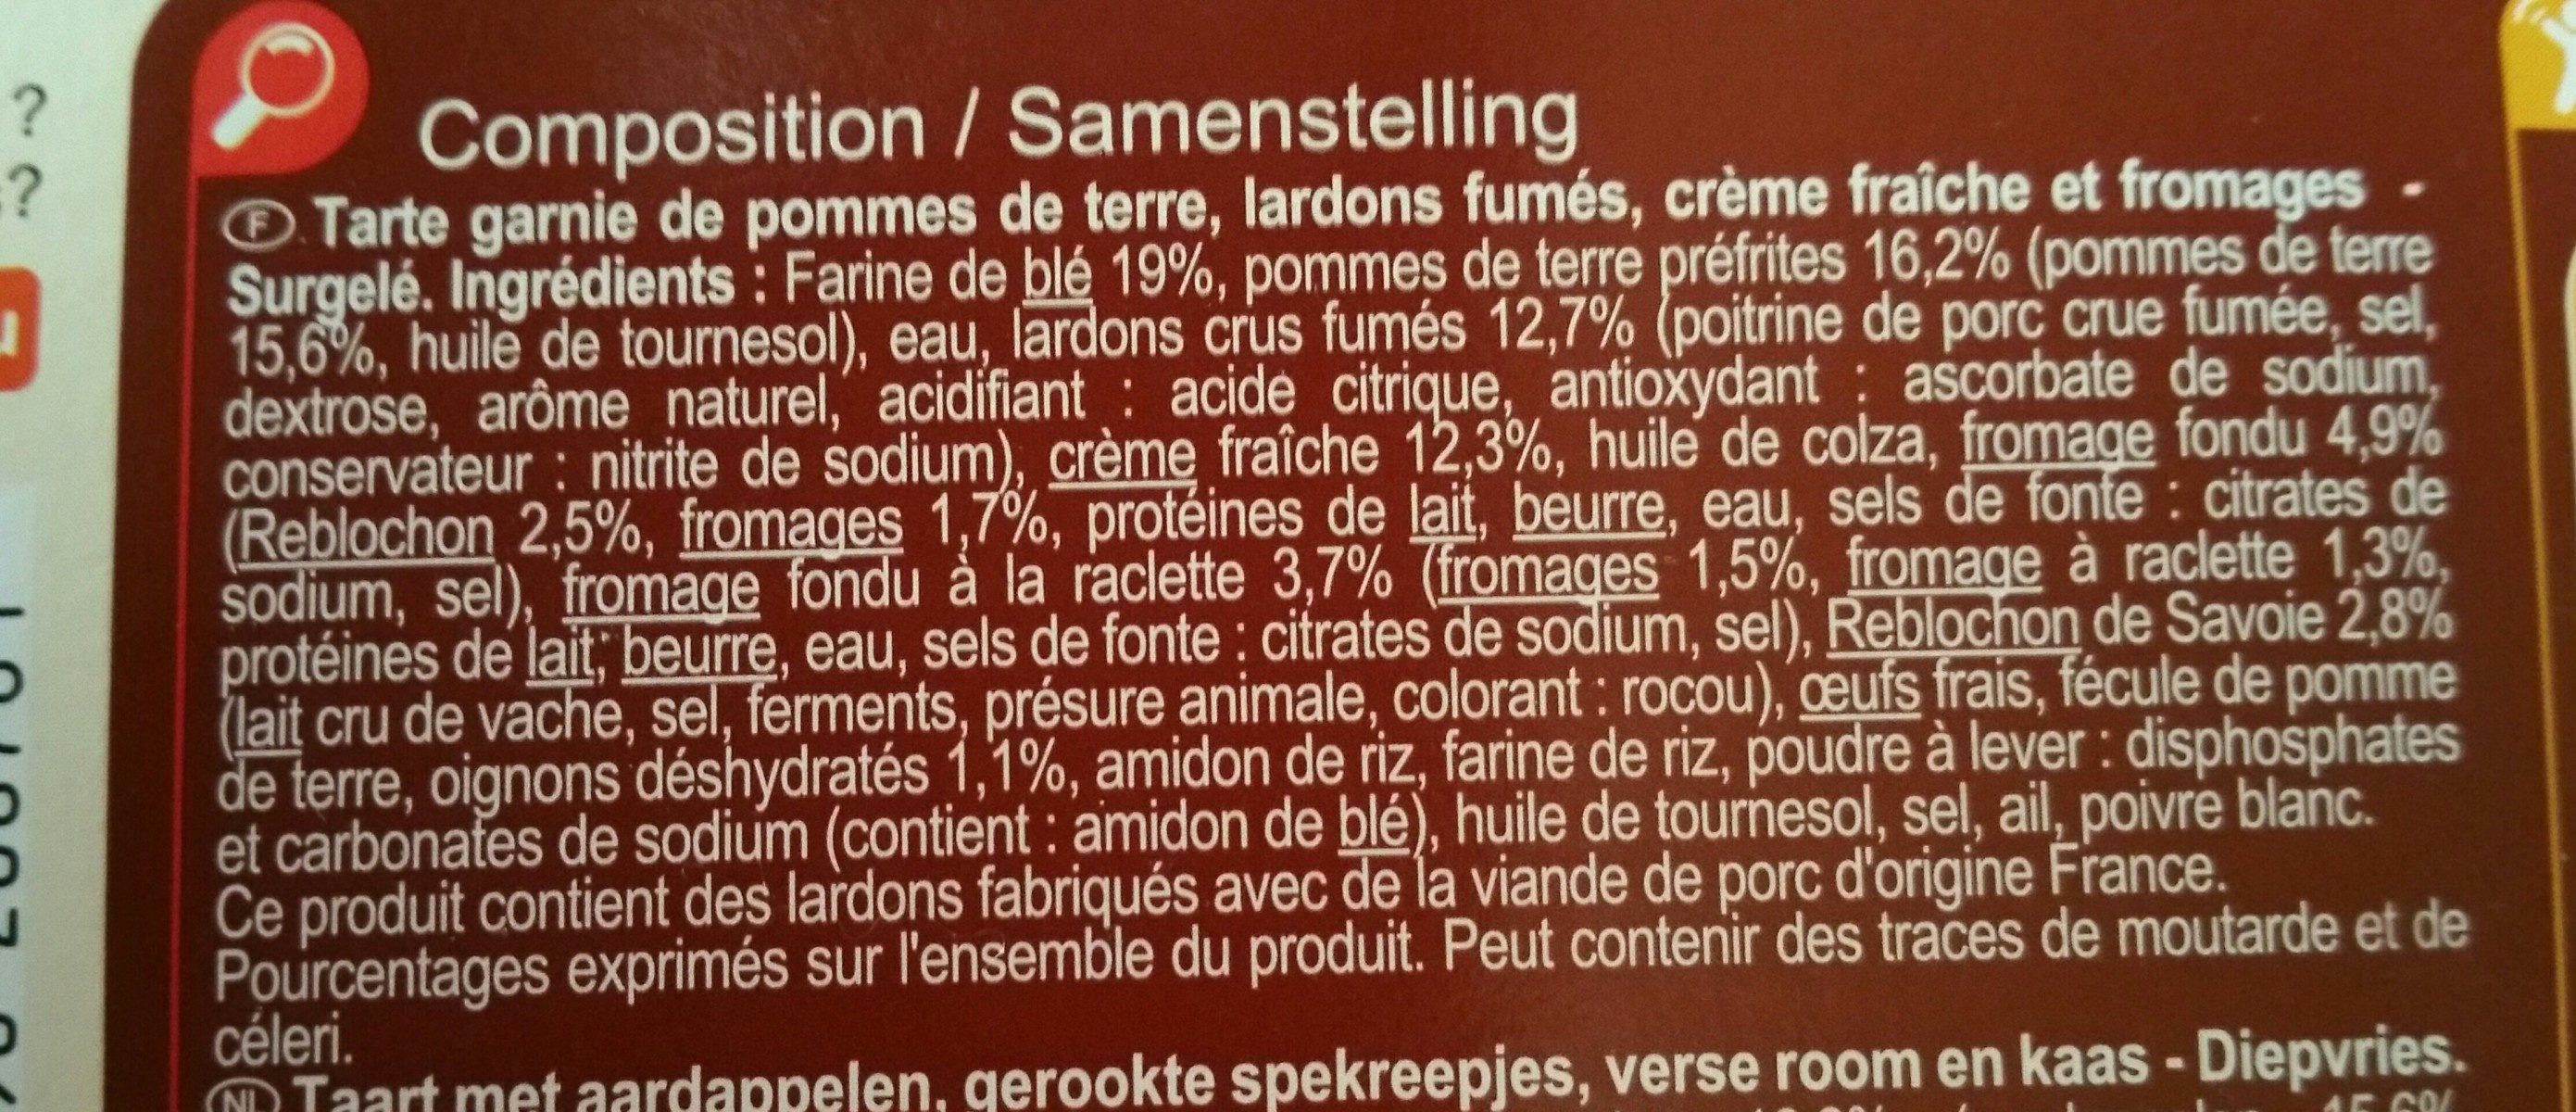 Tarte Tartiflette 400 Grammes - Ingrédients - fr